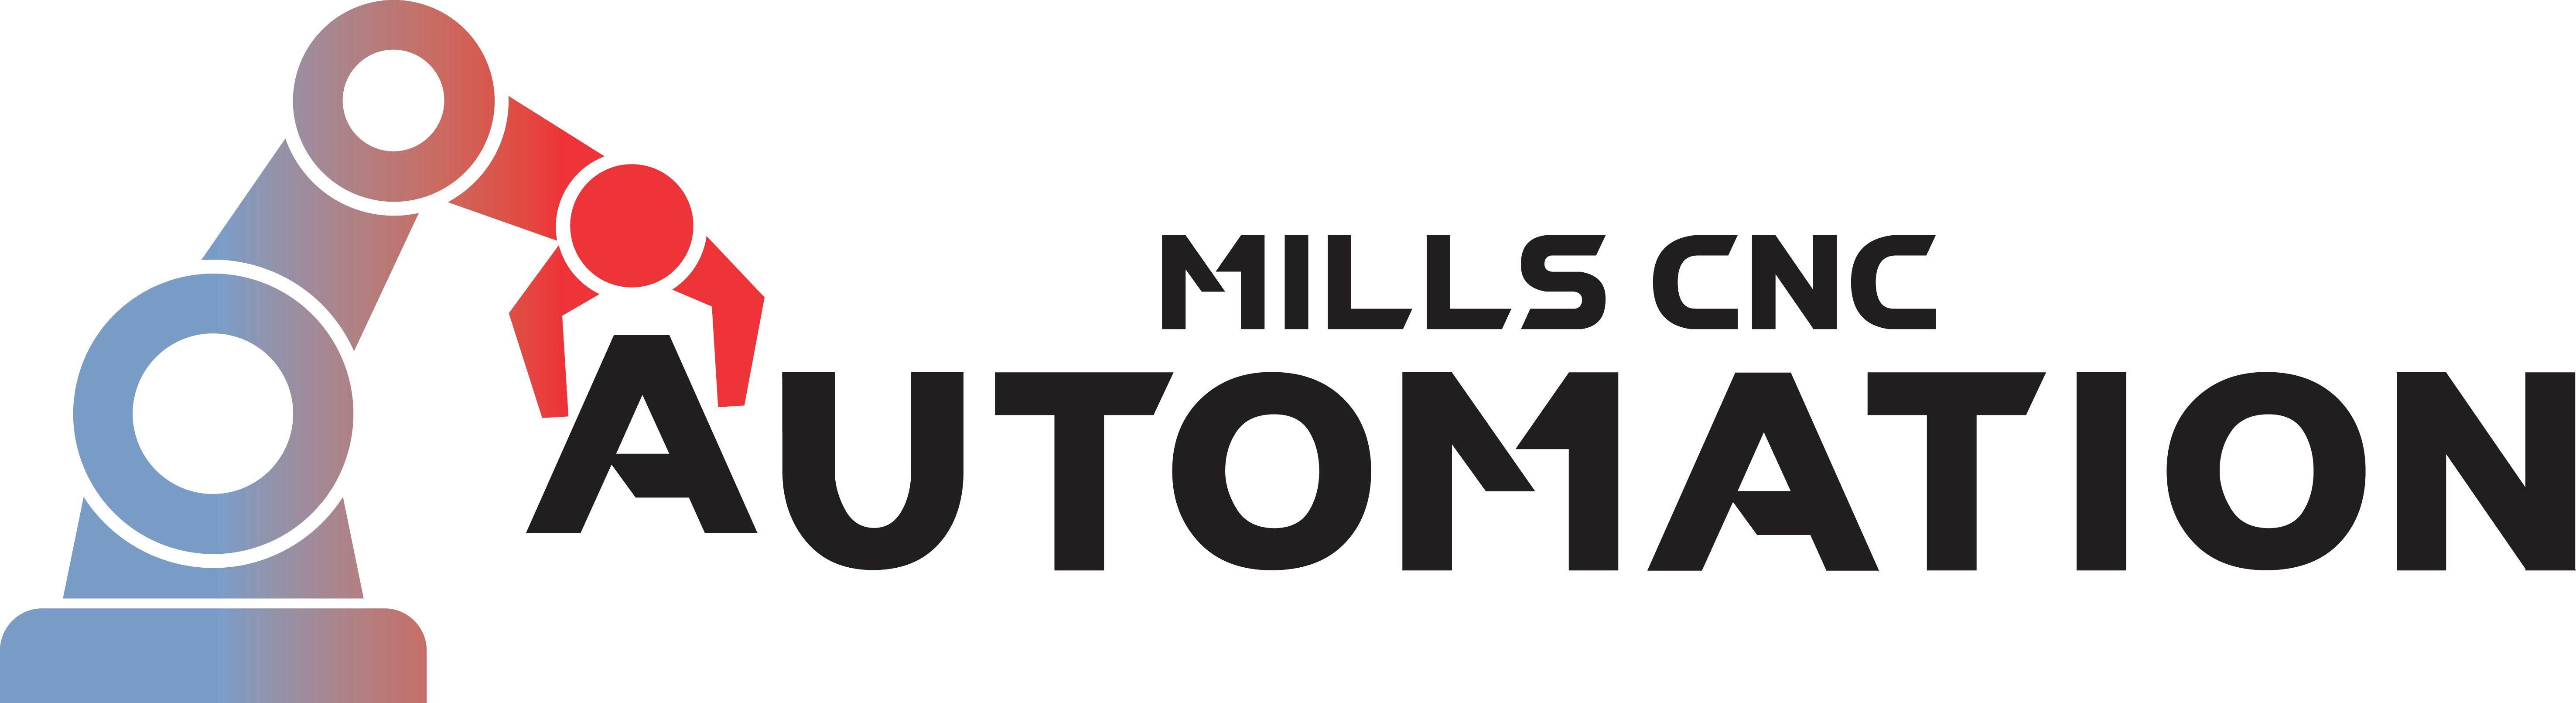 Mills CNC Automation